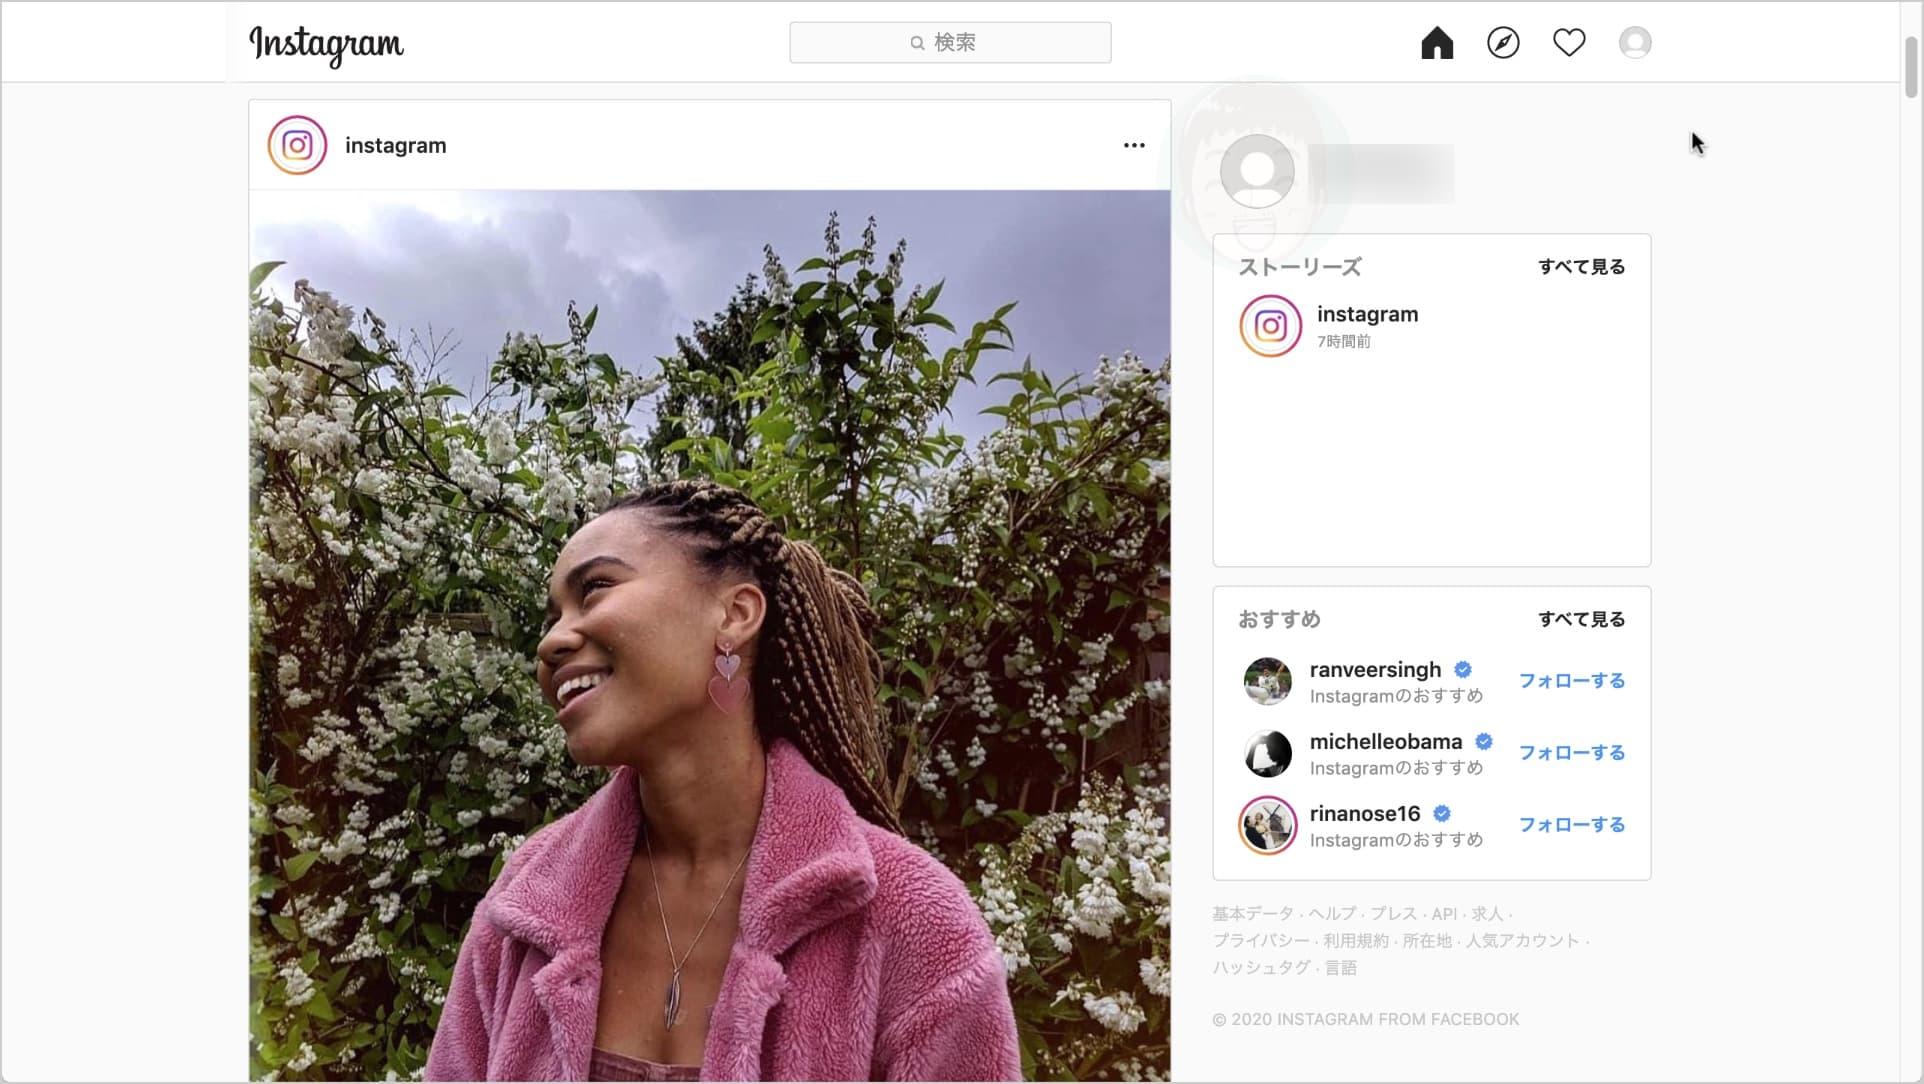 Instagramのホームが開いたら、登録はほぼ完了